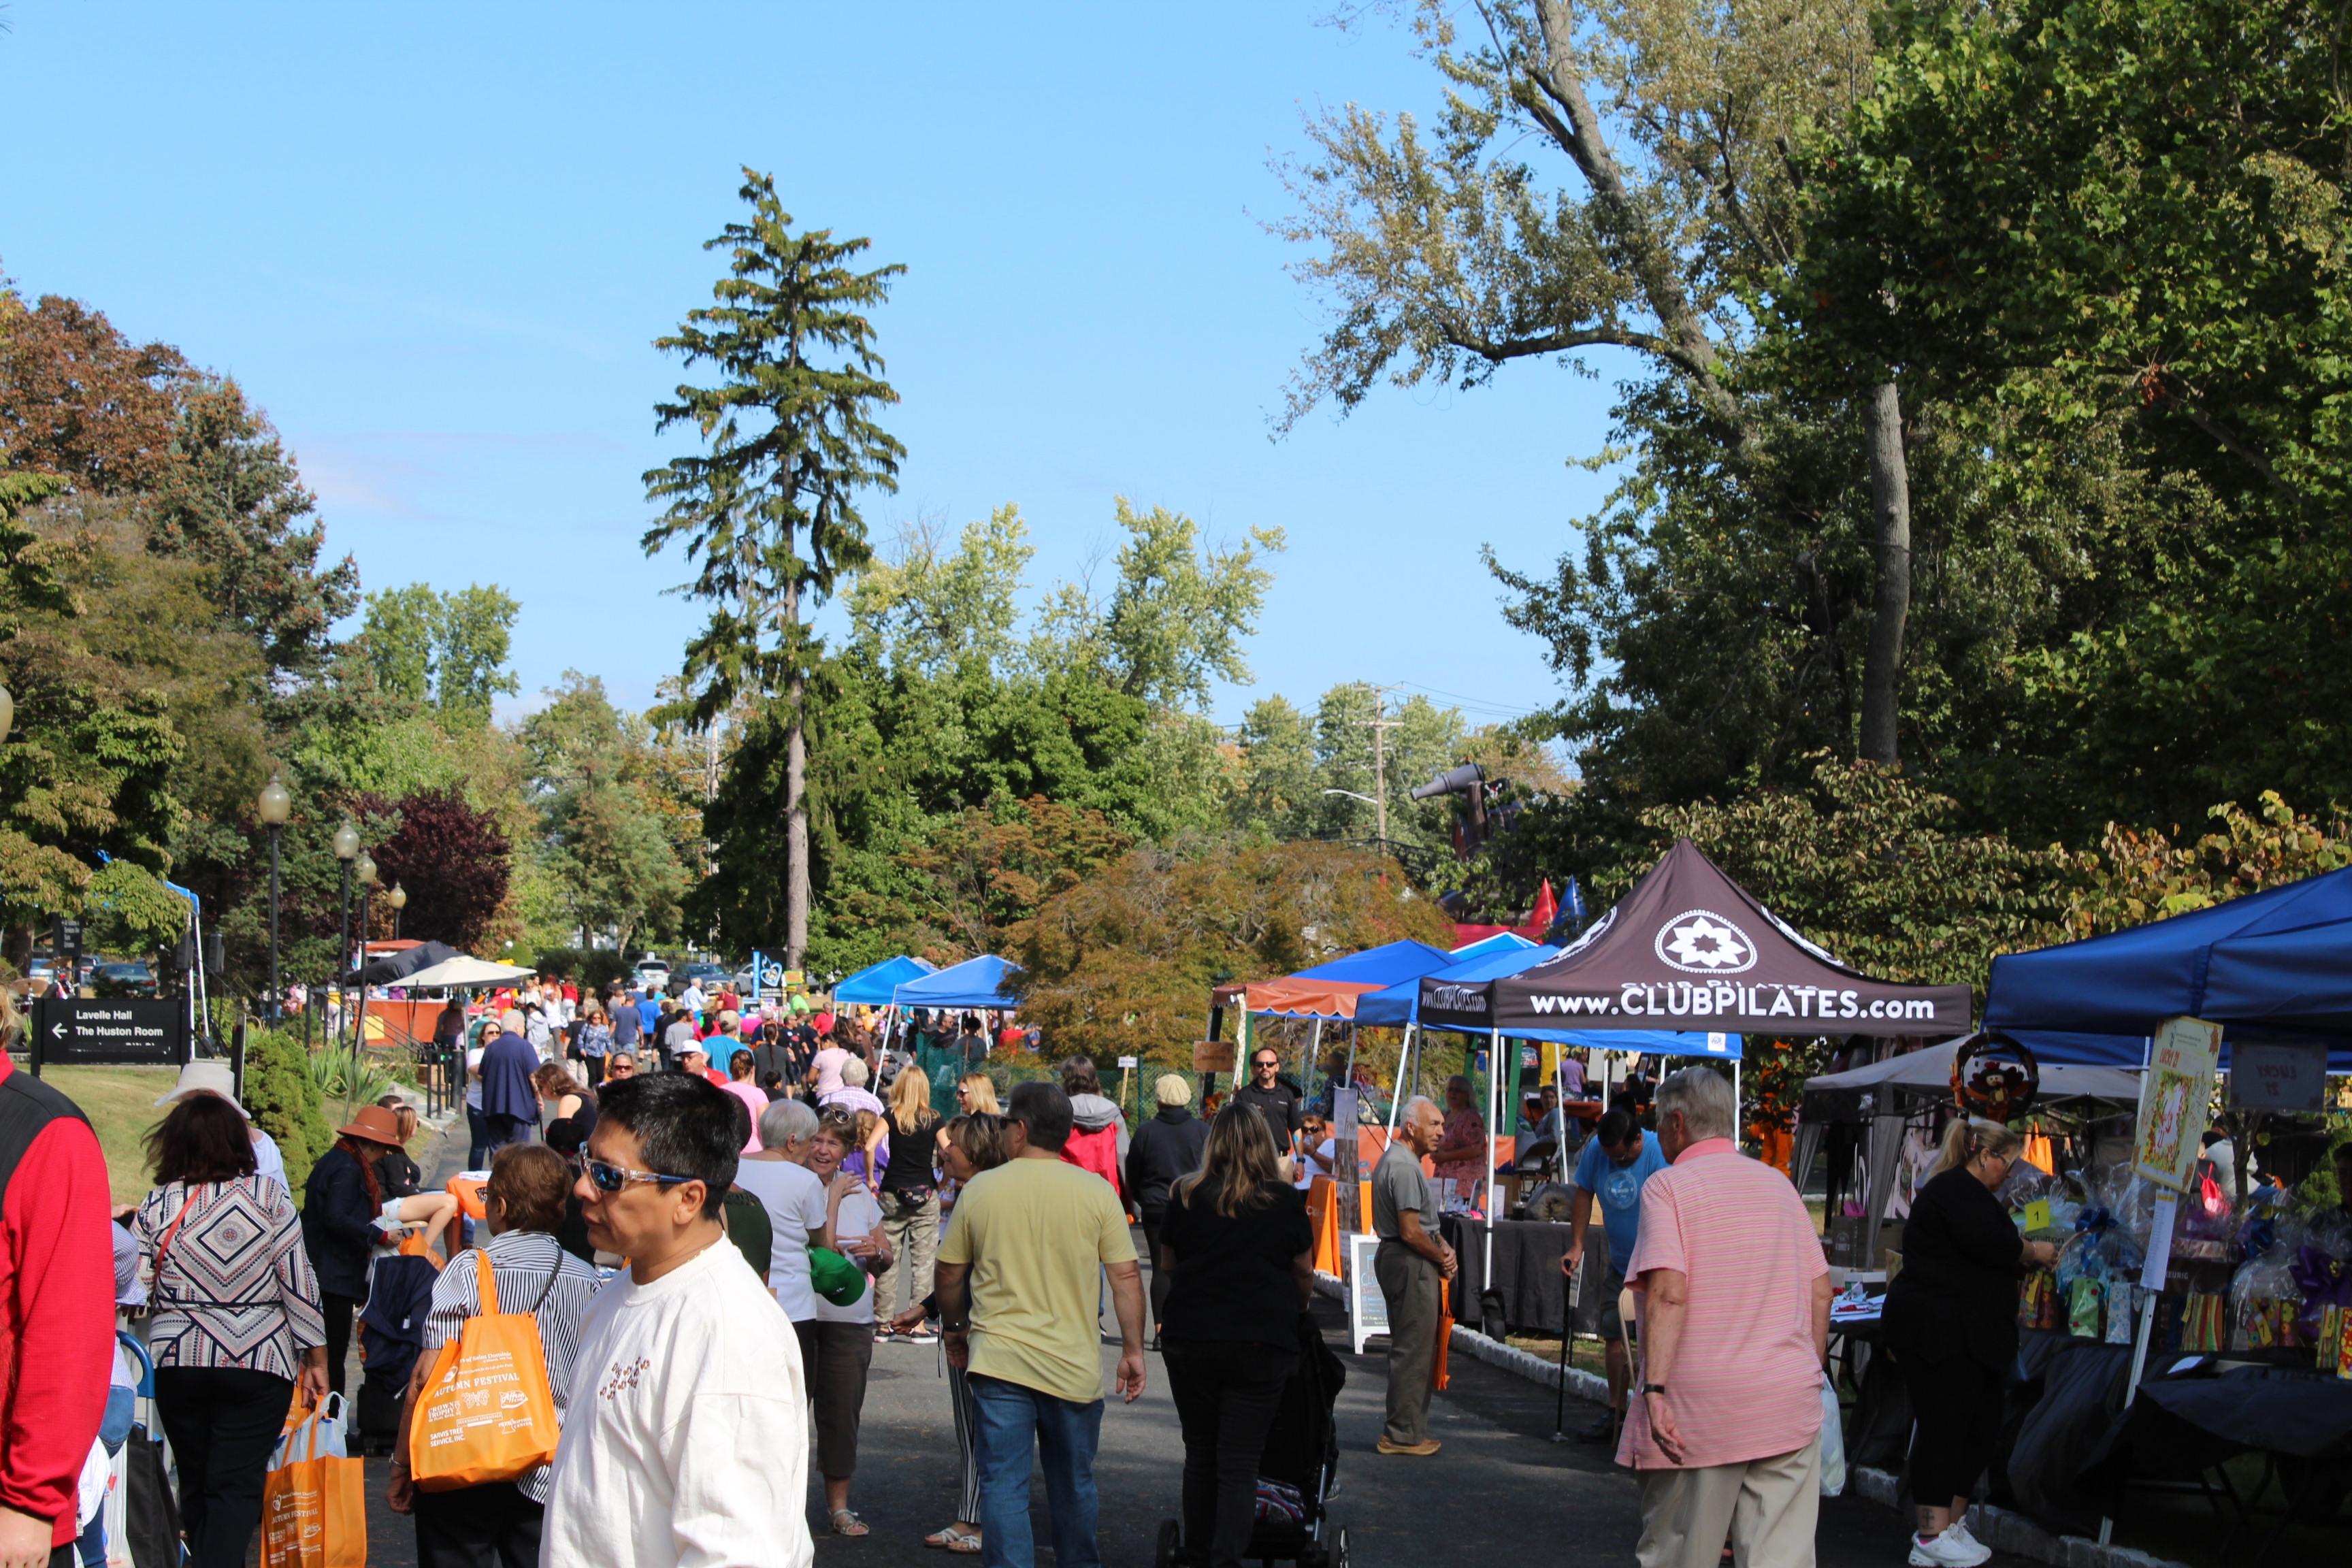 CANCELED: Blauvelt Autumn Festival at Sisters of Saint Dominic of Blauvelt